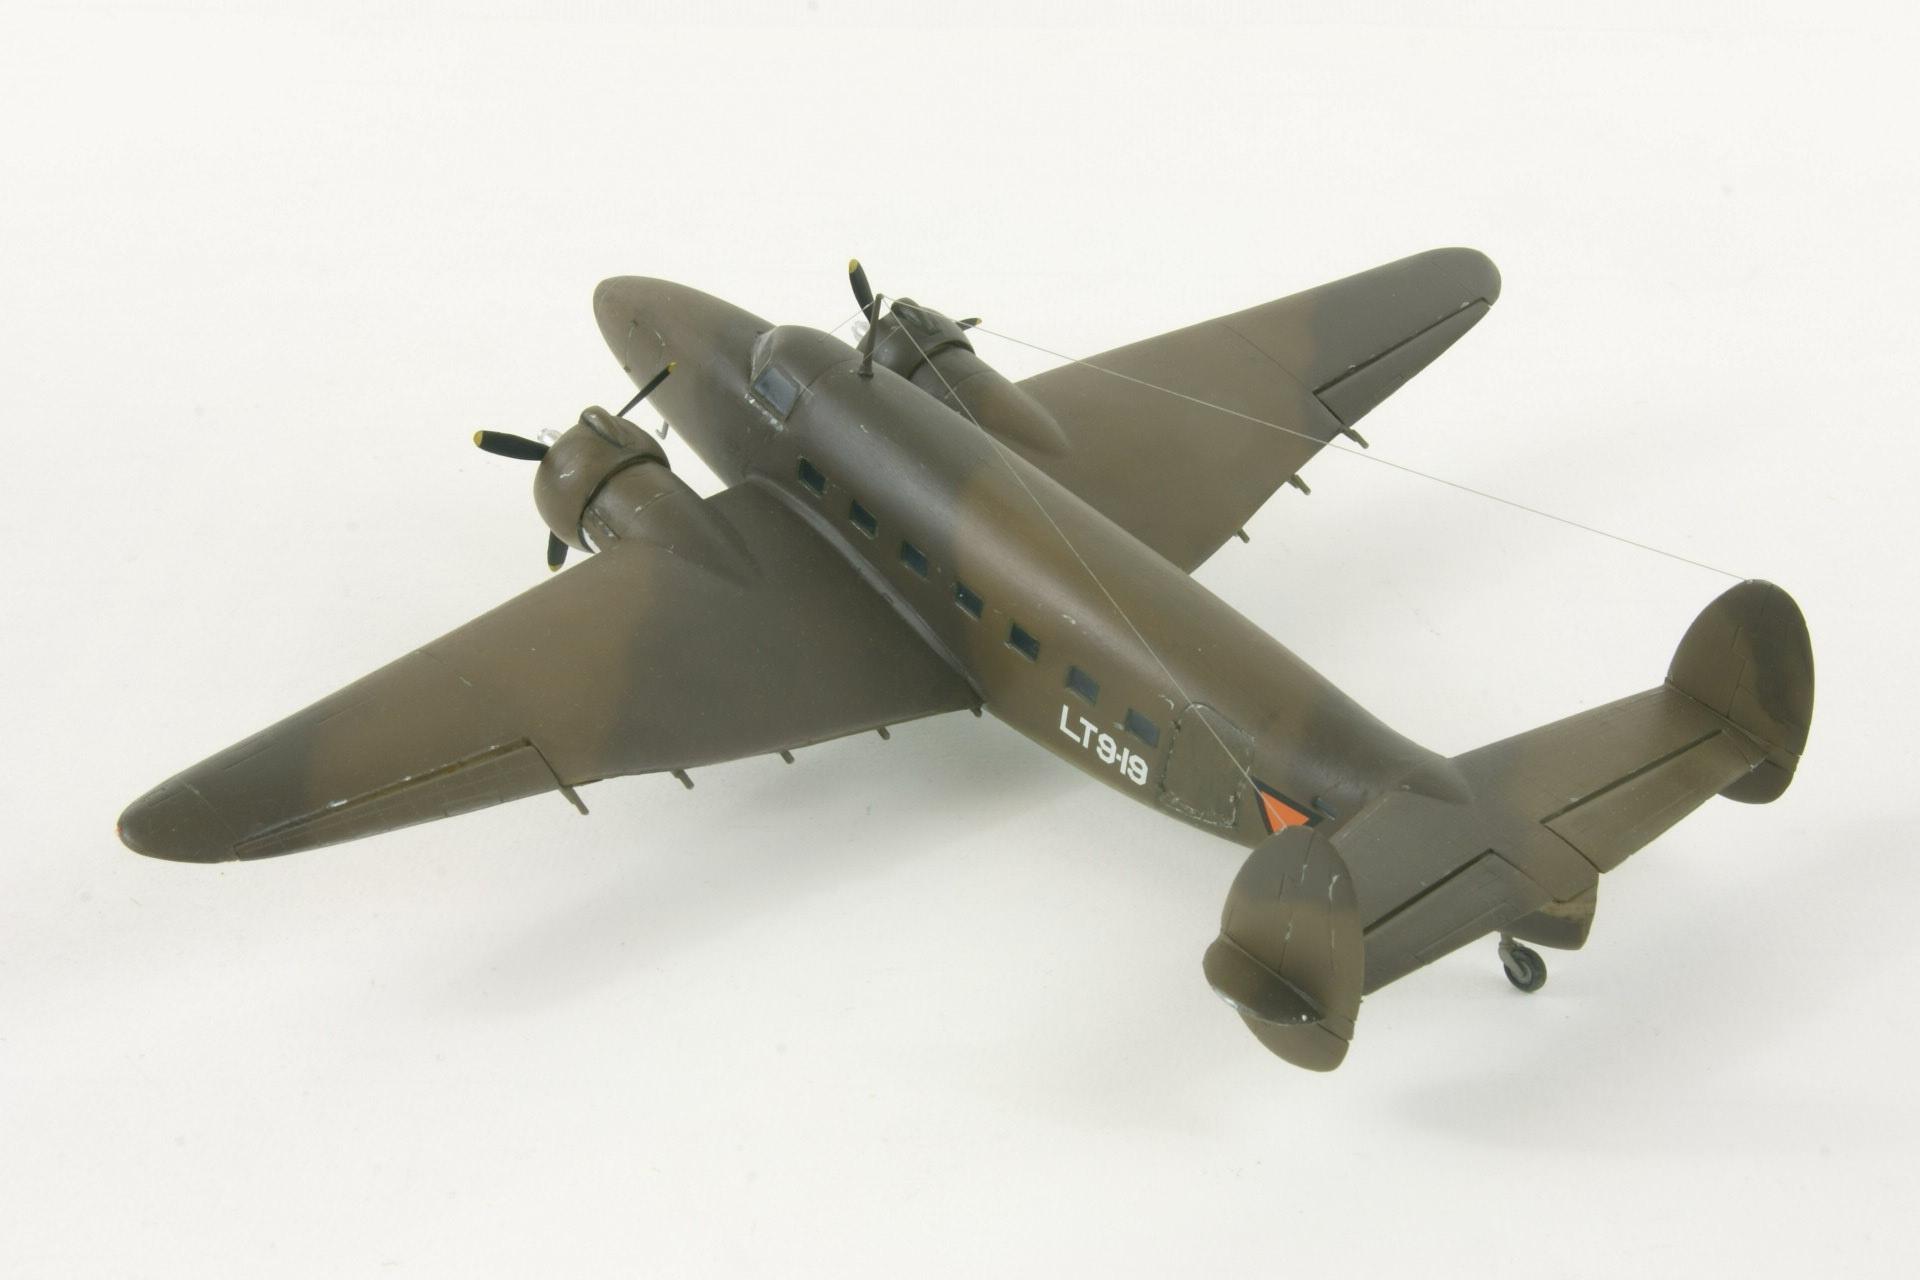 Lockheed lodestar 2 2